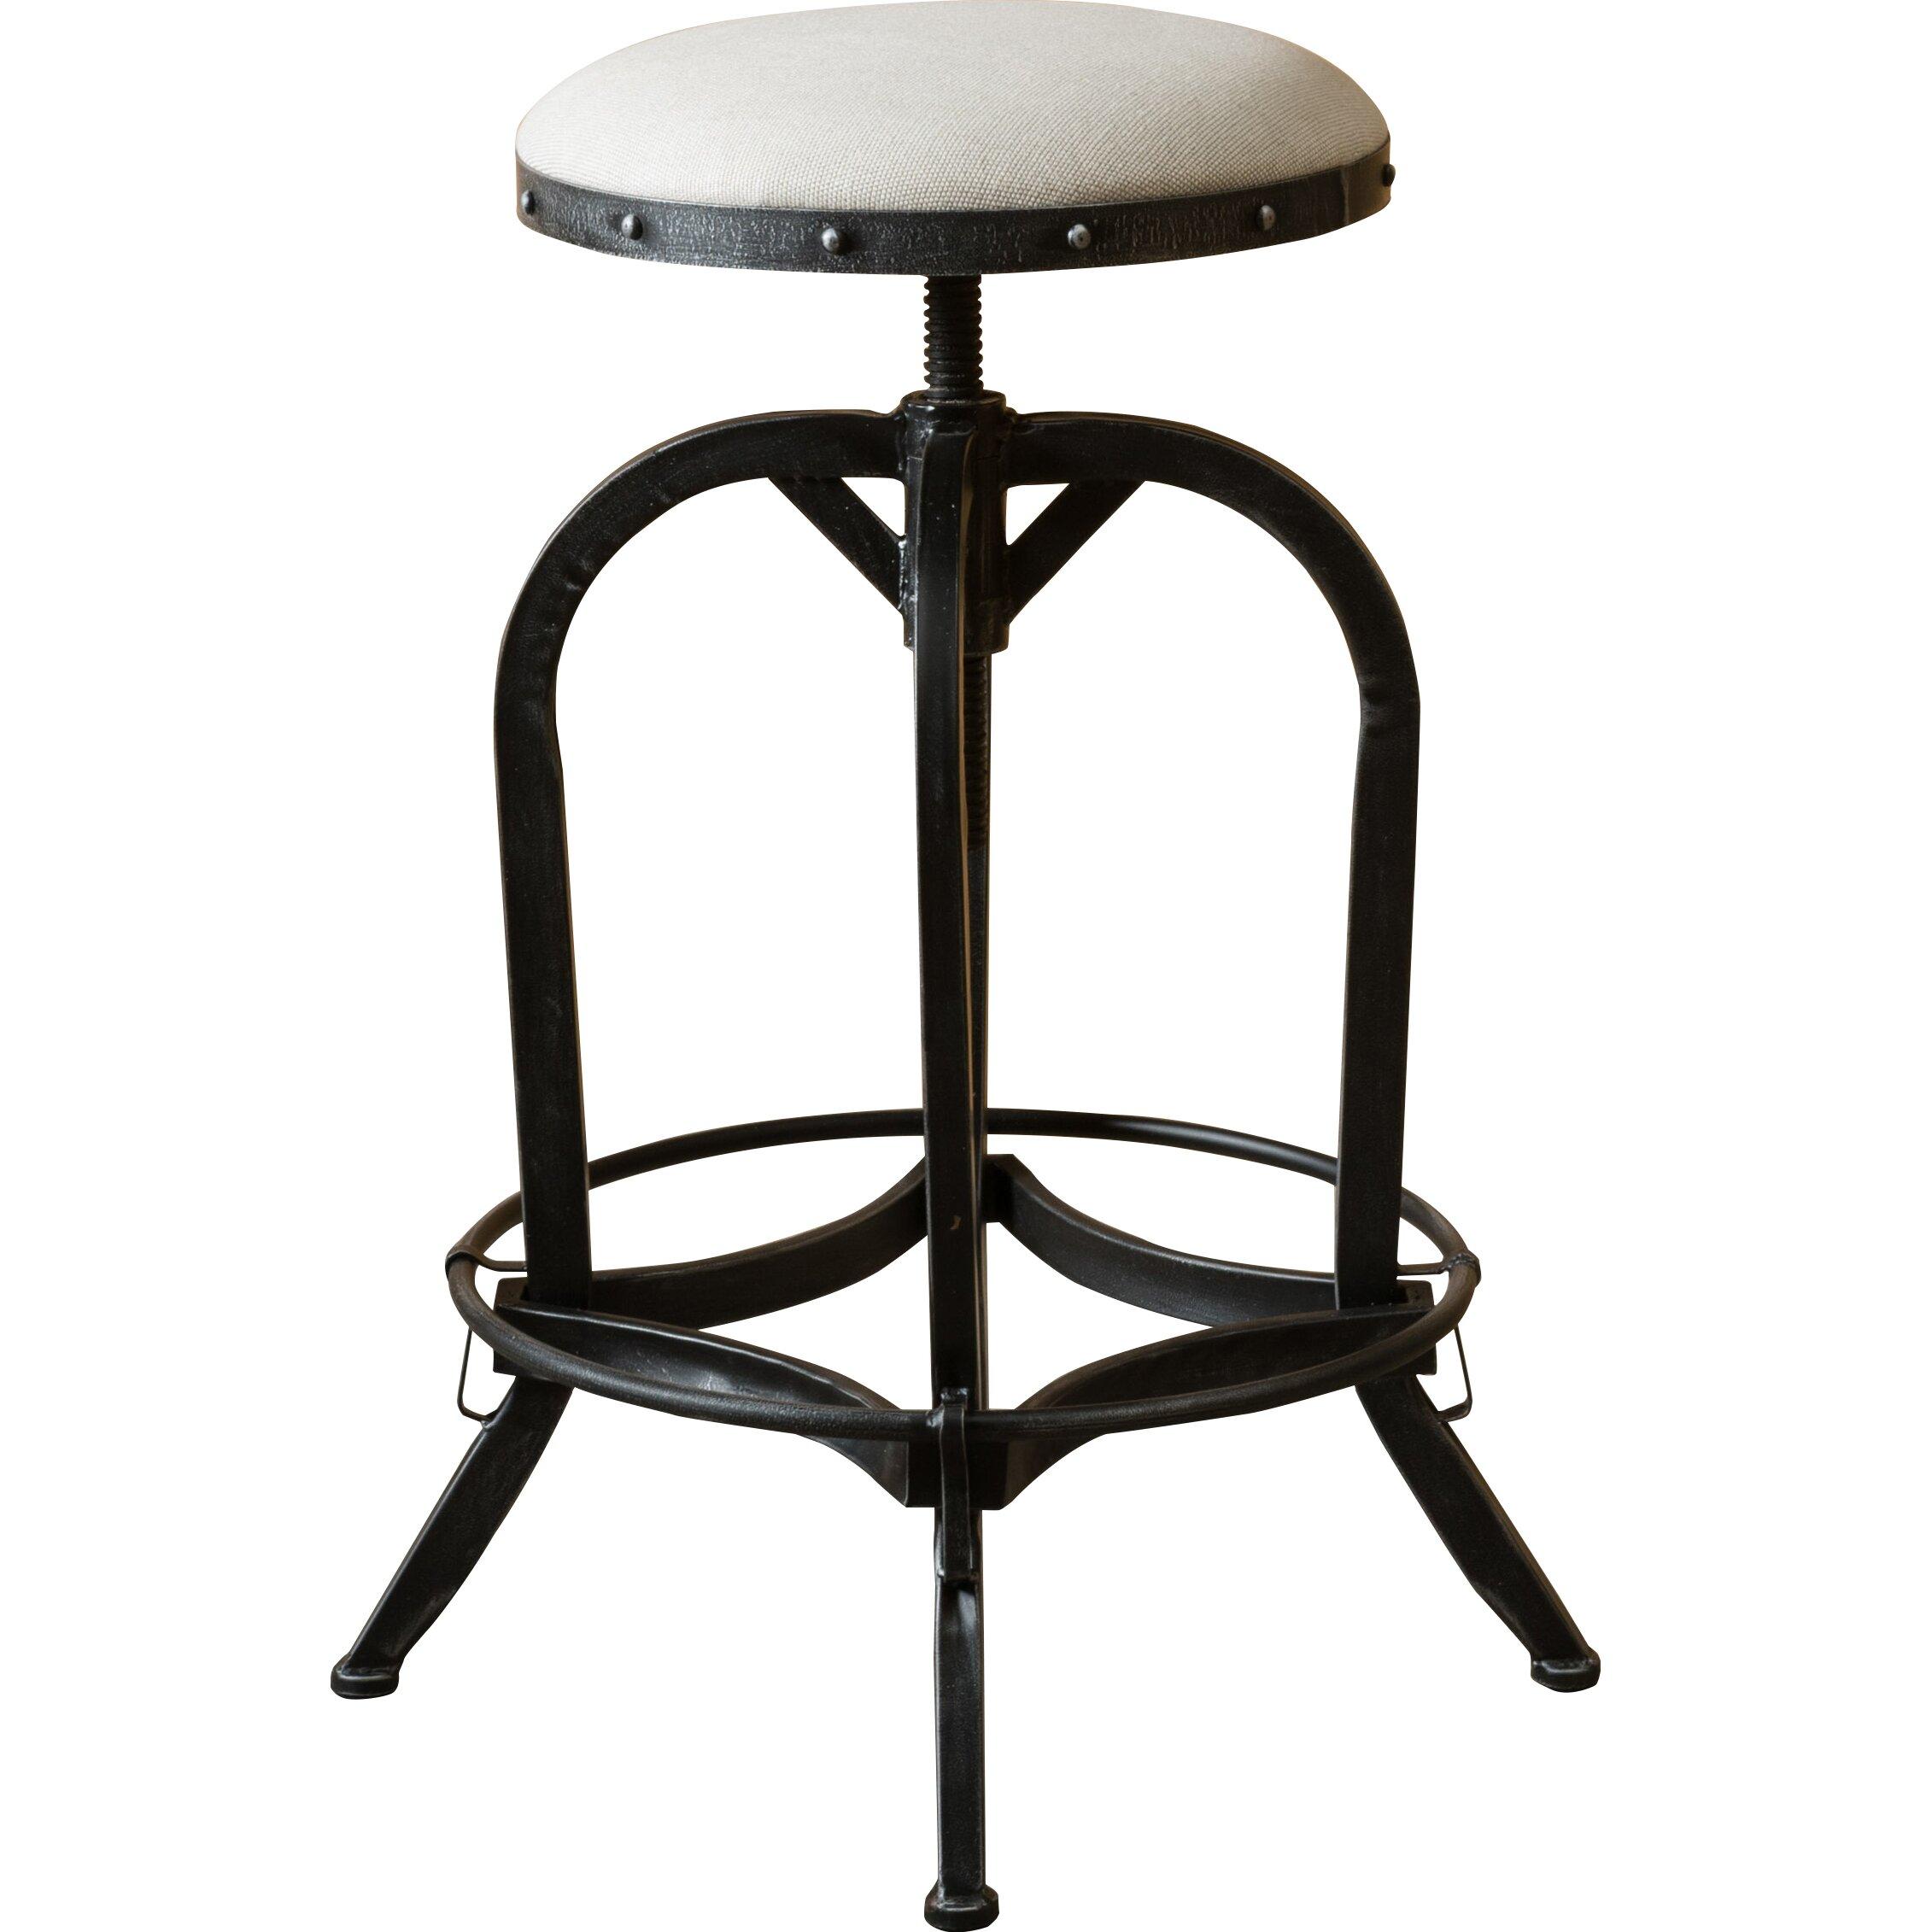 home loft concepts adjustable height swivel bar stool reviews wayfair. Black Bedroom Furniture Sets. Home Design Ideas